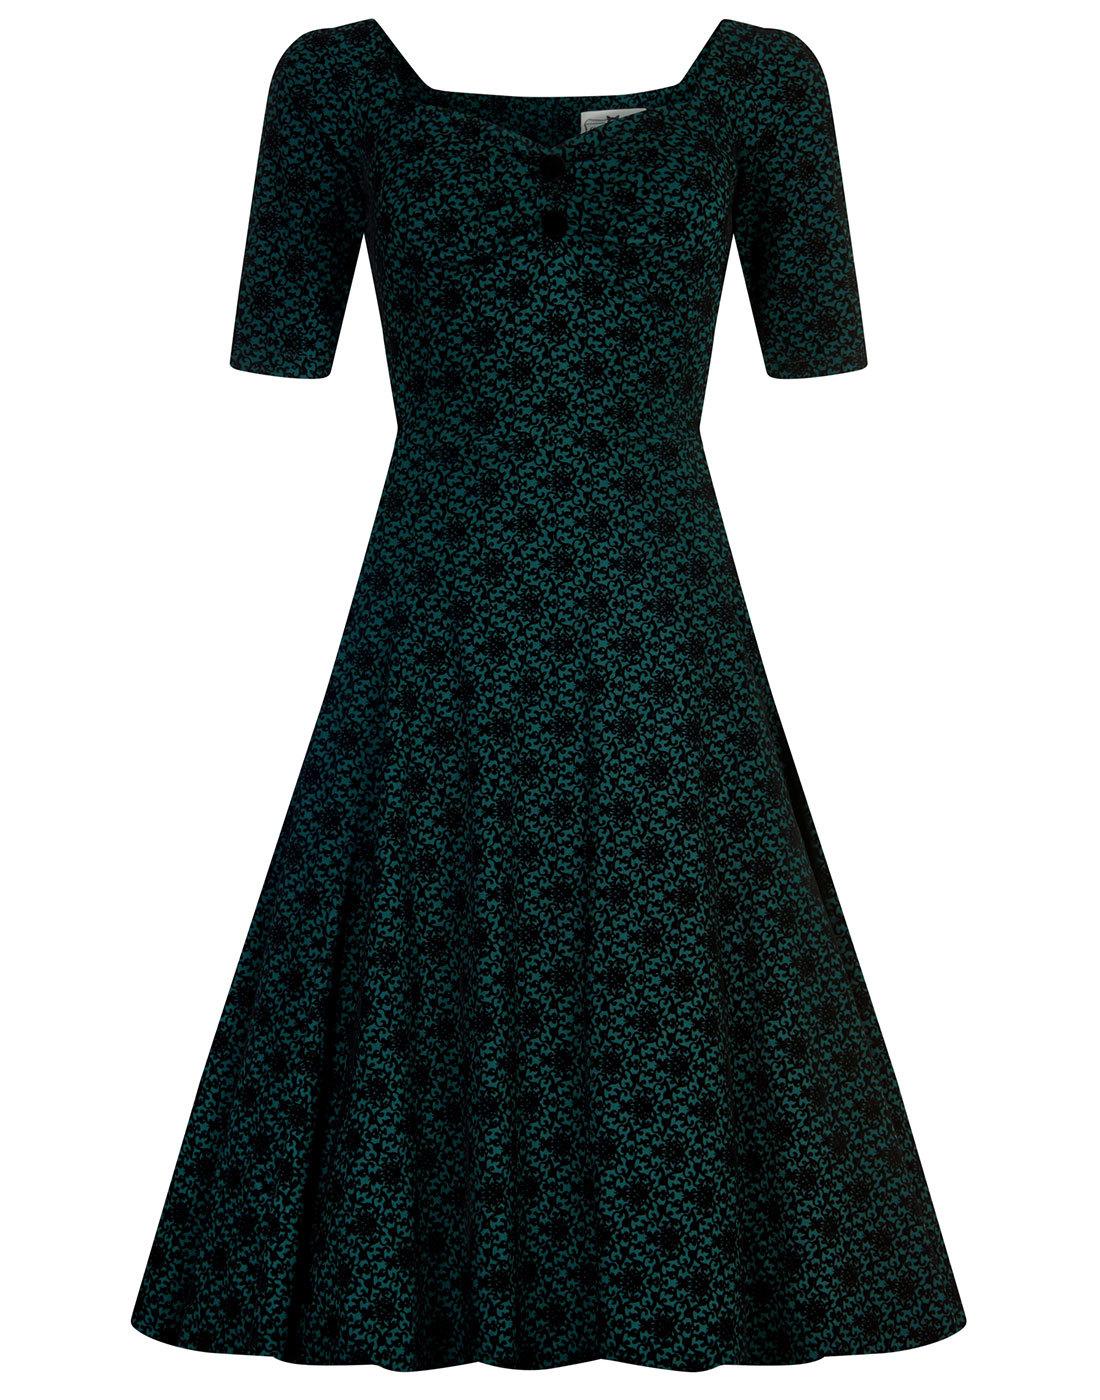 Dolores COLLECTIF Half Sleeve Brocade Doll Dress